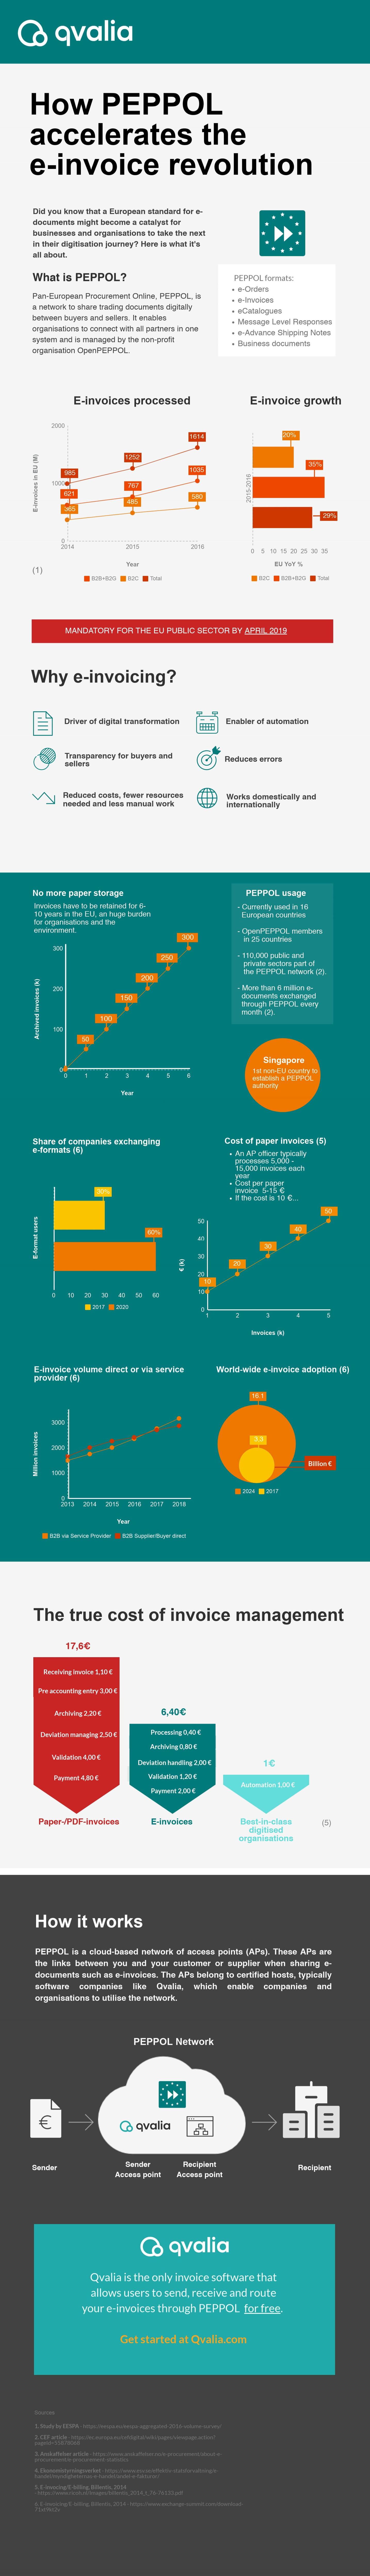 Infographic-PEPPOL-e-invoice